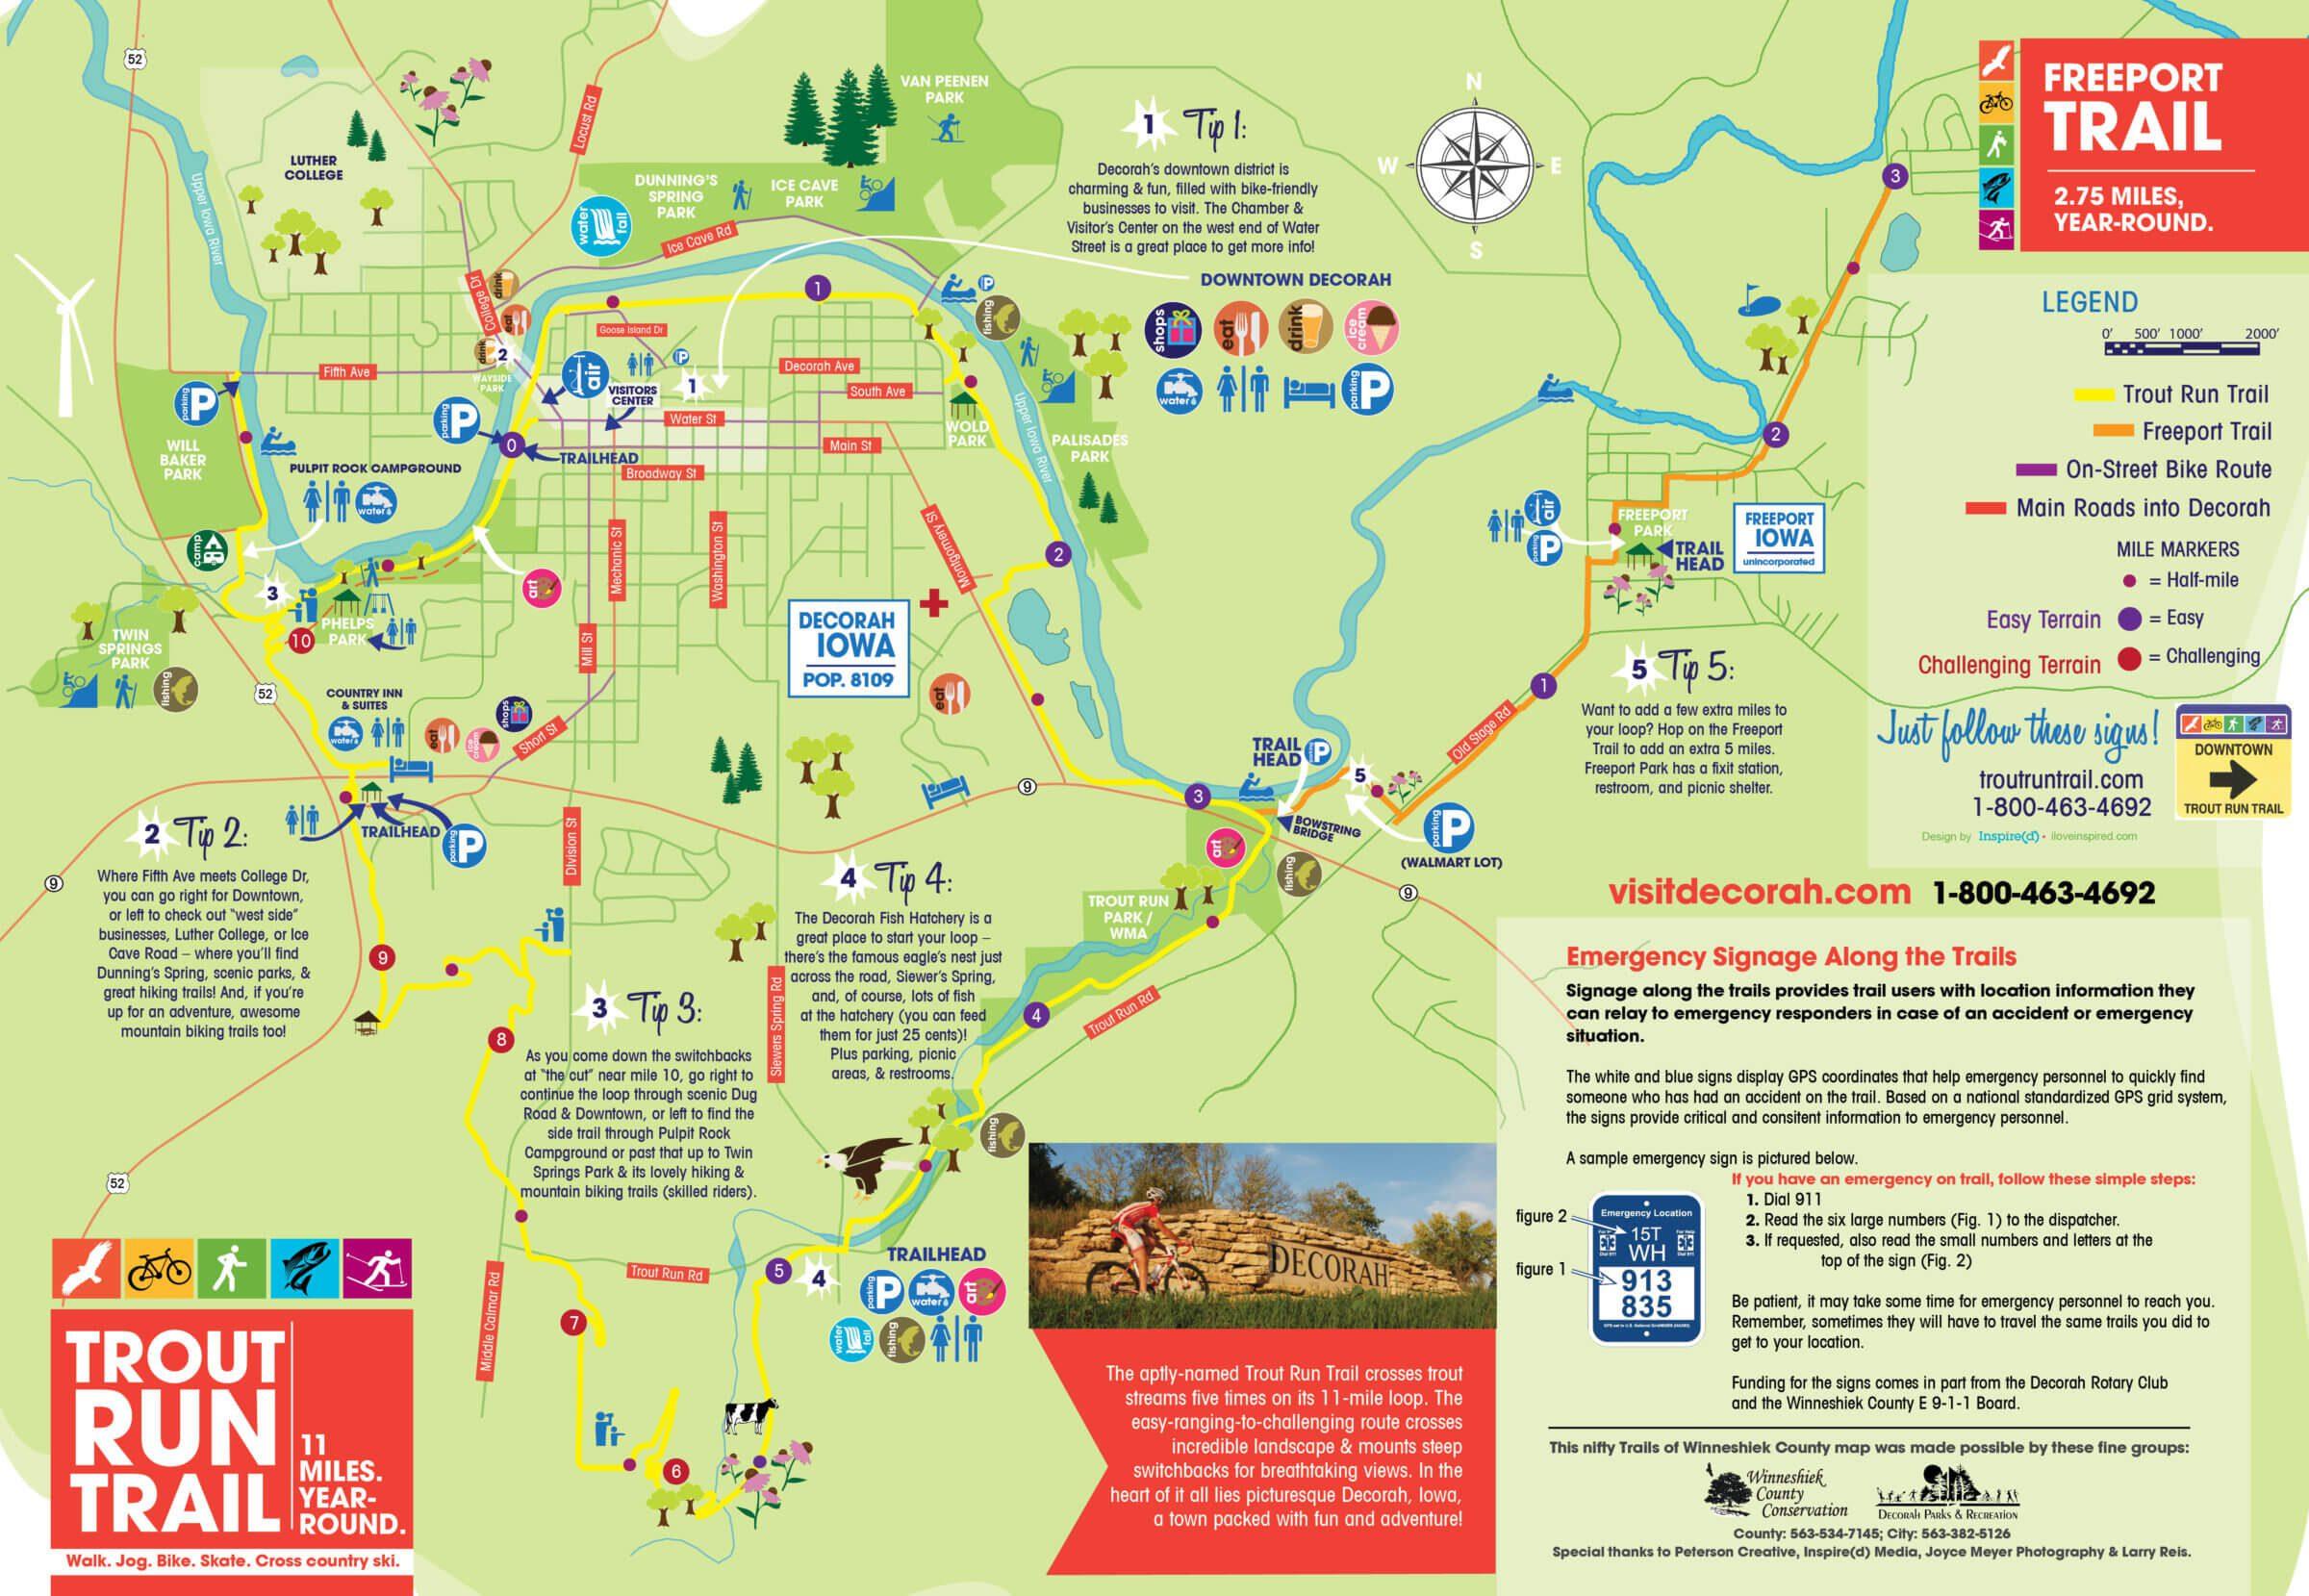 Trail Maps Decorah Park Recreation Department - At trail map